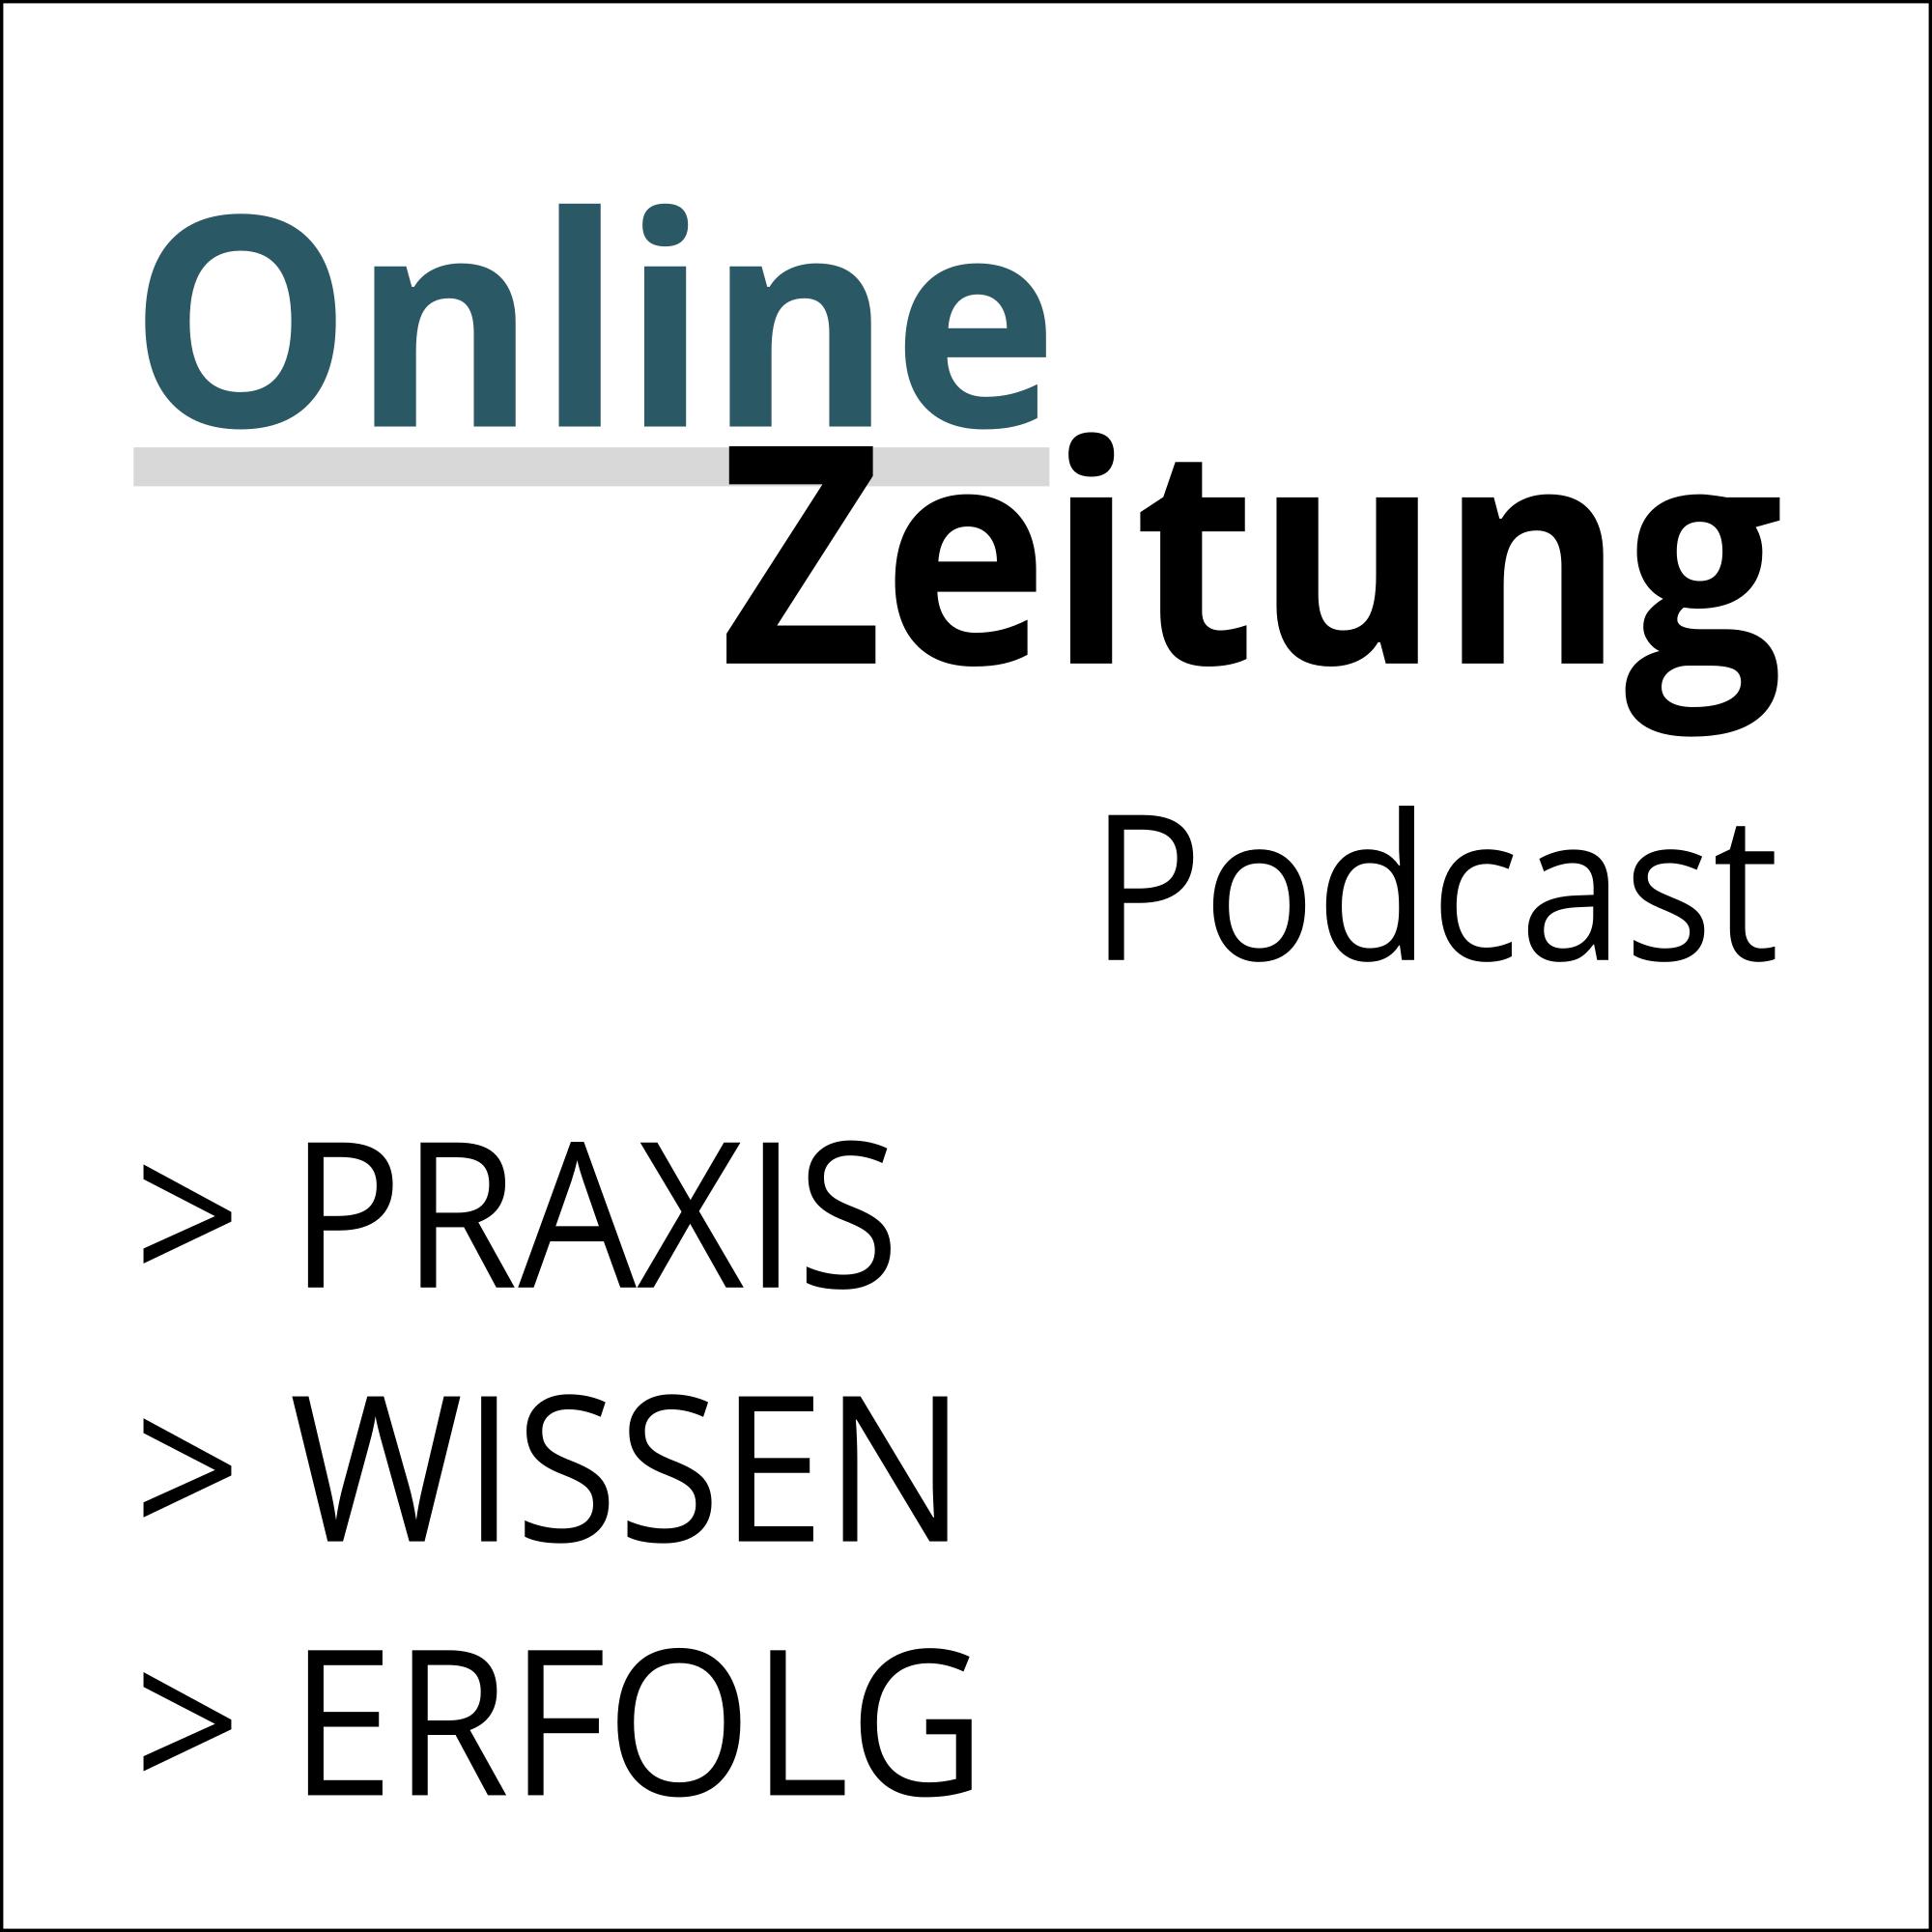 Online Podcast | Listen via Stitcher for Podcasts